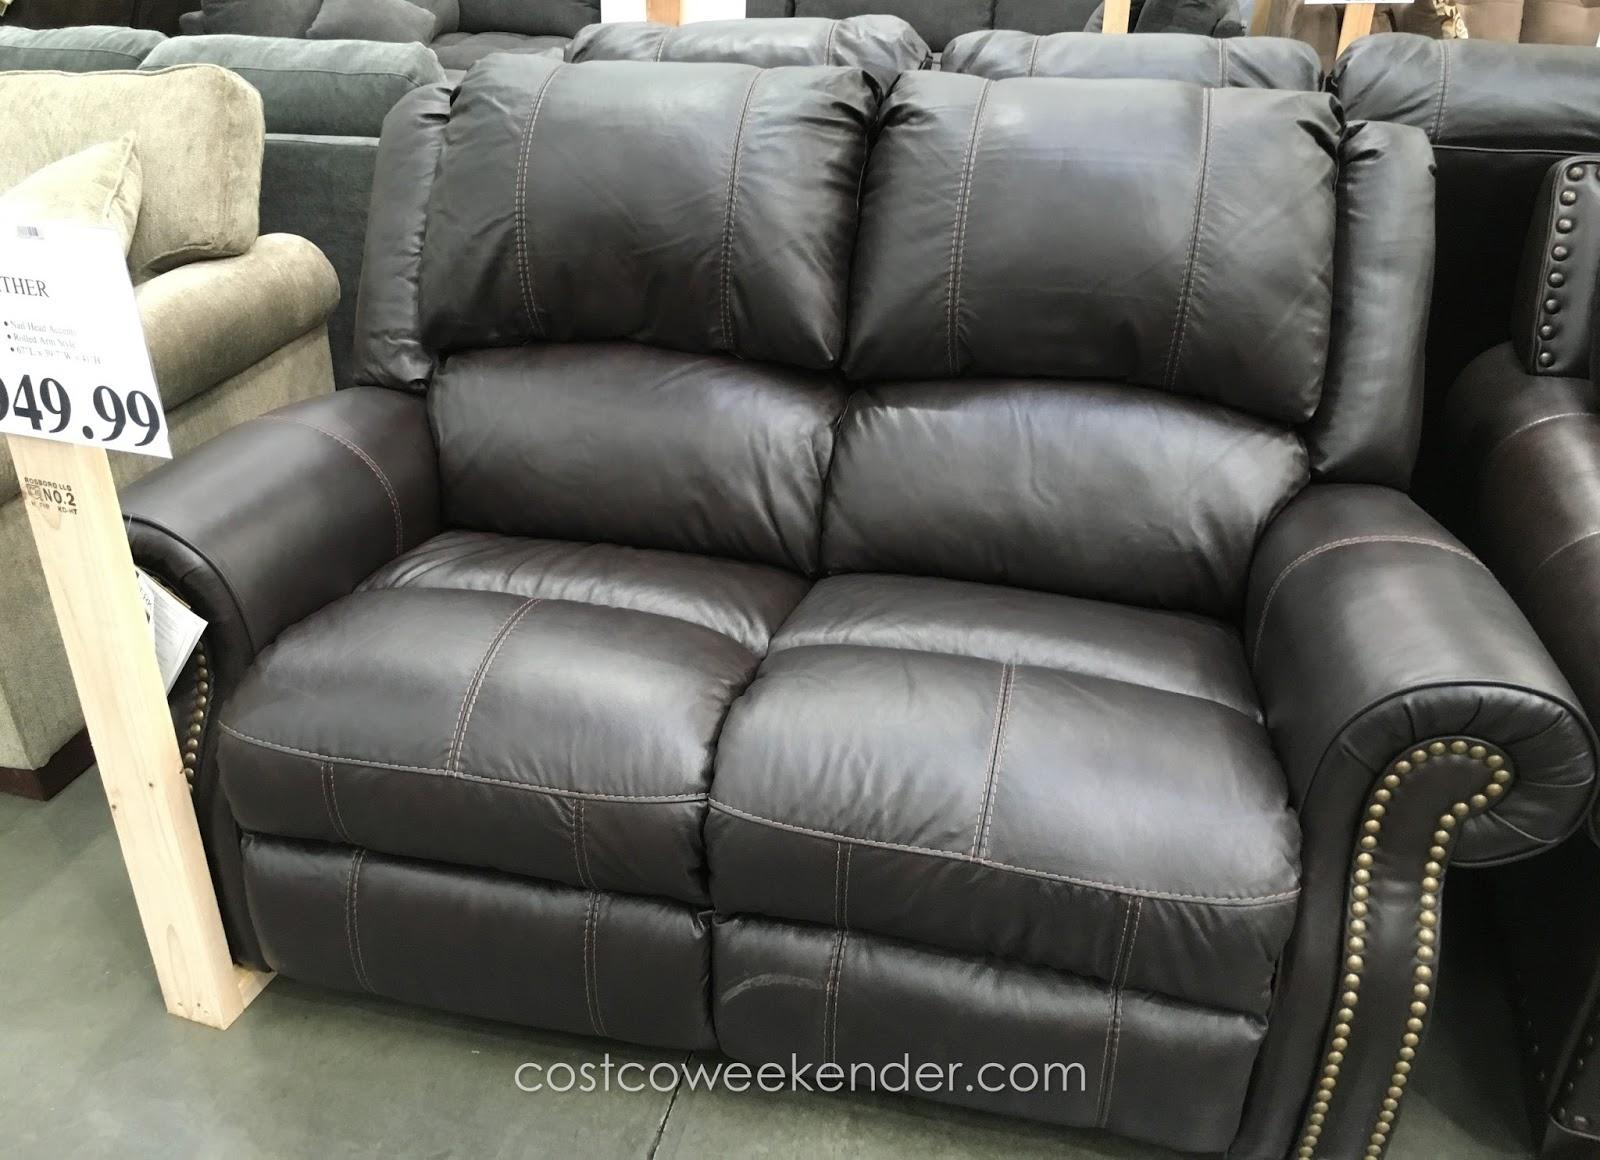 Berkline Reclining Leather Loveseat Costco Weekender